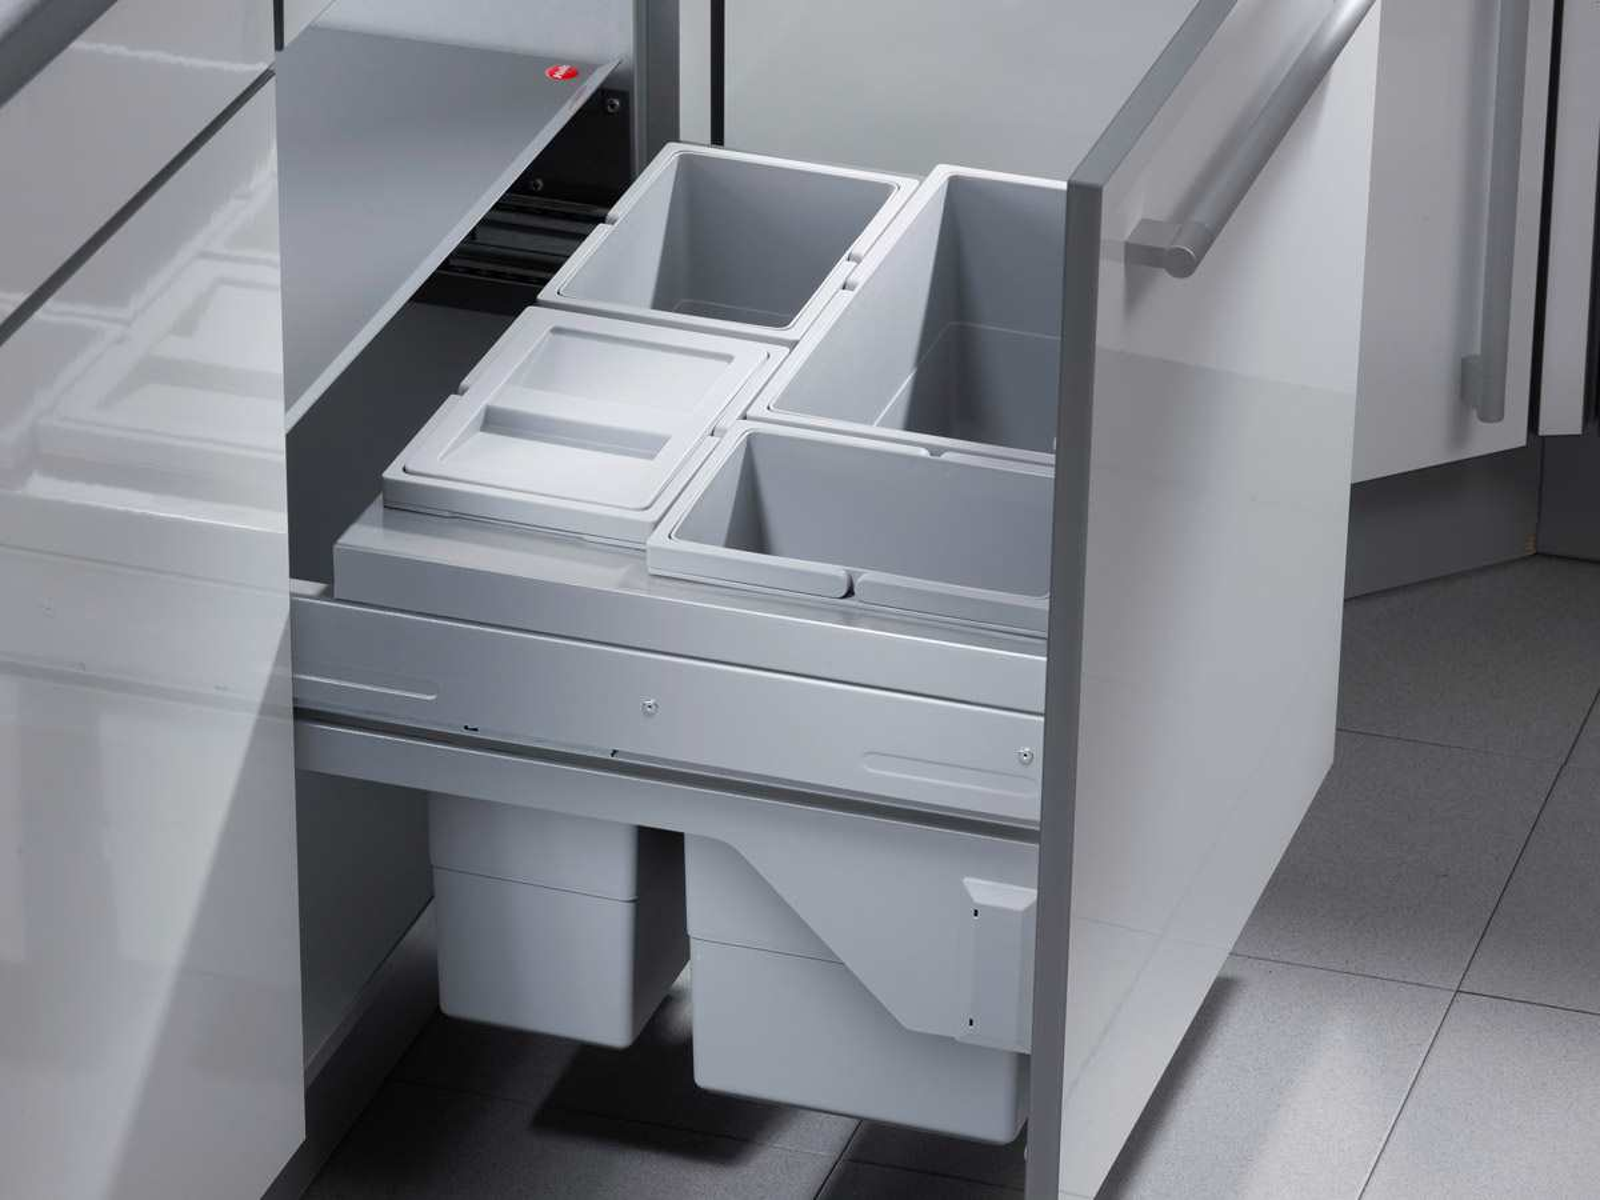 hailo cargo soft 3610 64 einbau abfallsammler. Black Bedroom Furniture Sets. Home Design Ideas